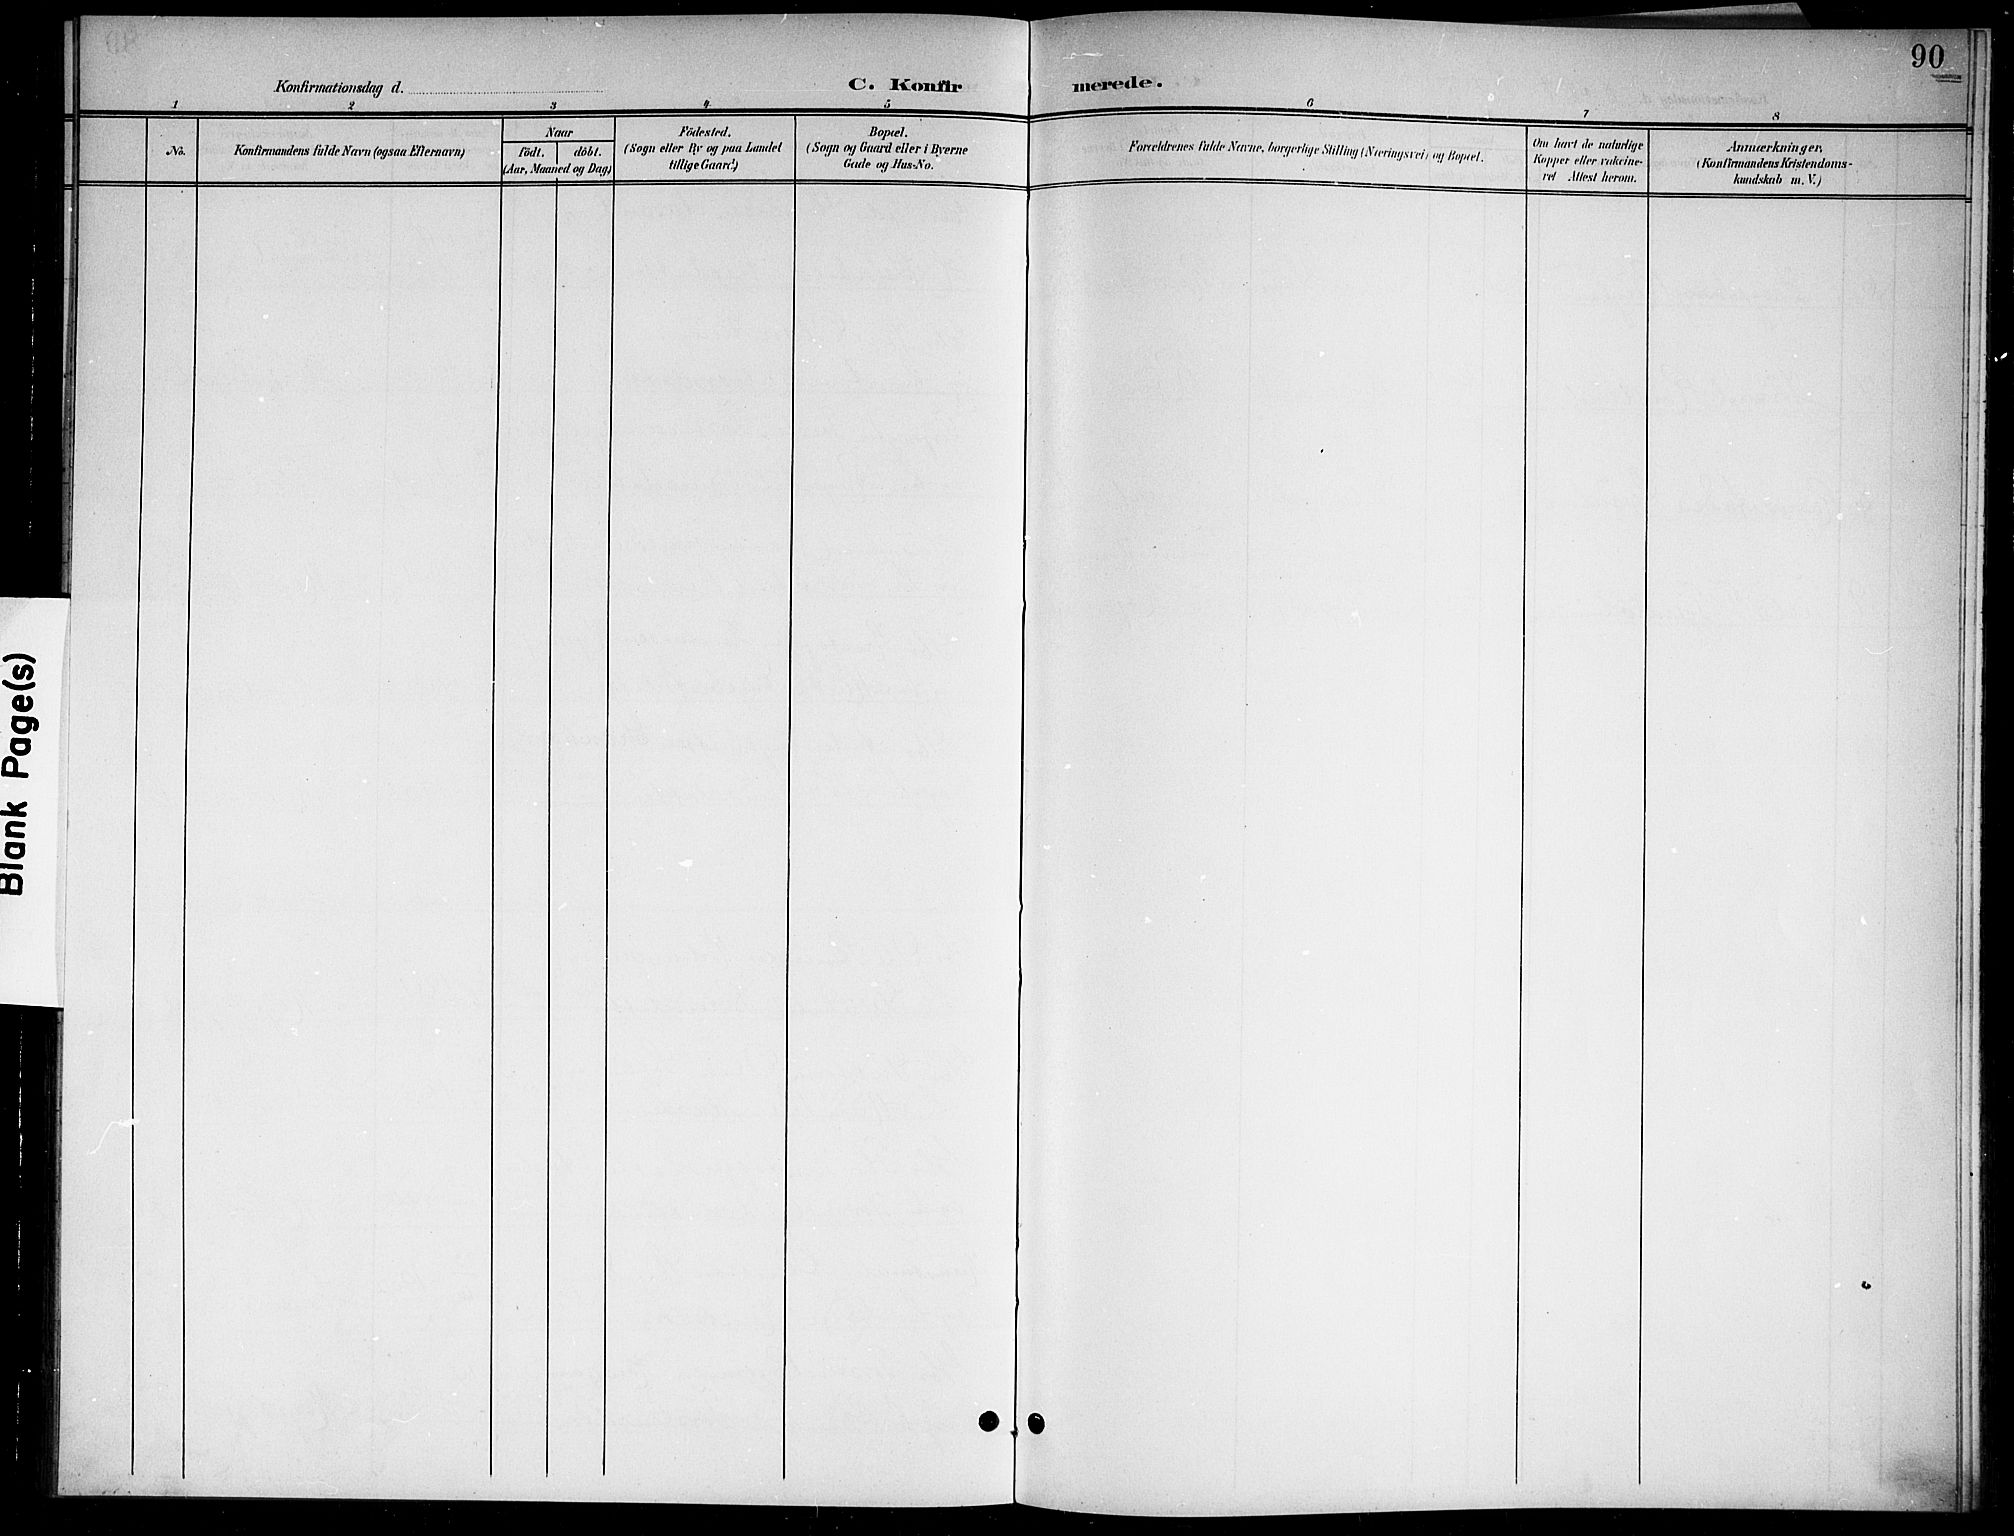 SAKO, Sigdal kirkebøker, G/Gb/L0003: Klokkerbok nr. II 3, 1901-1916, s. 90